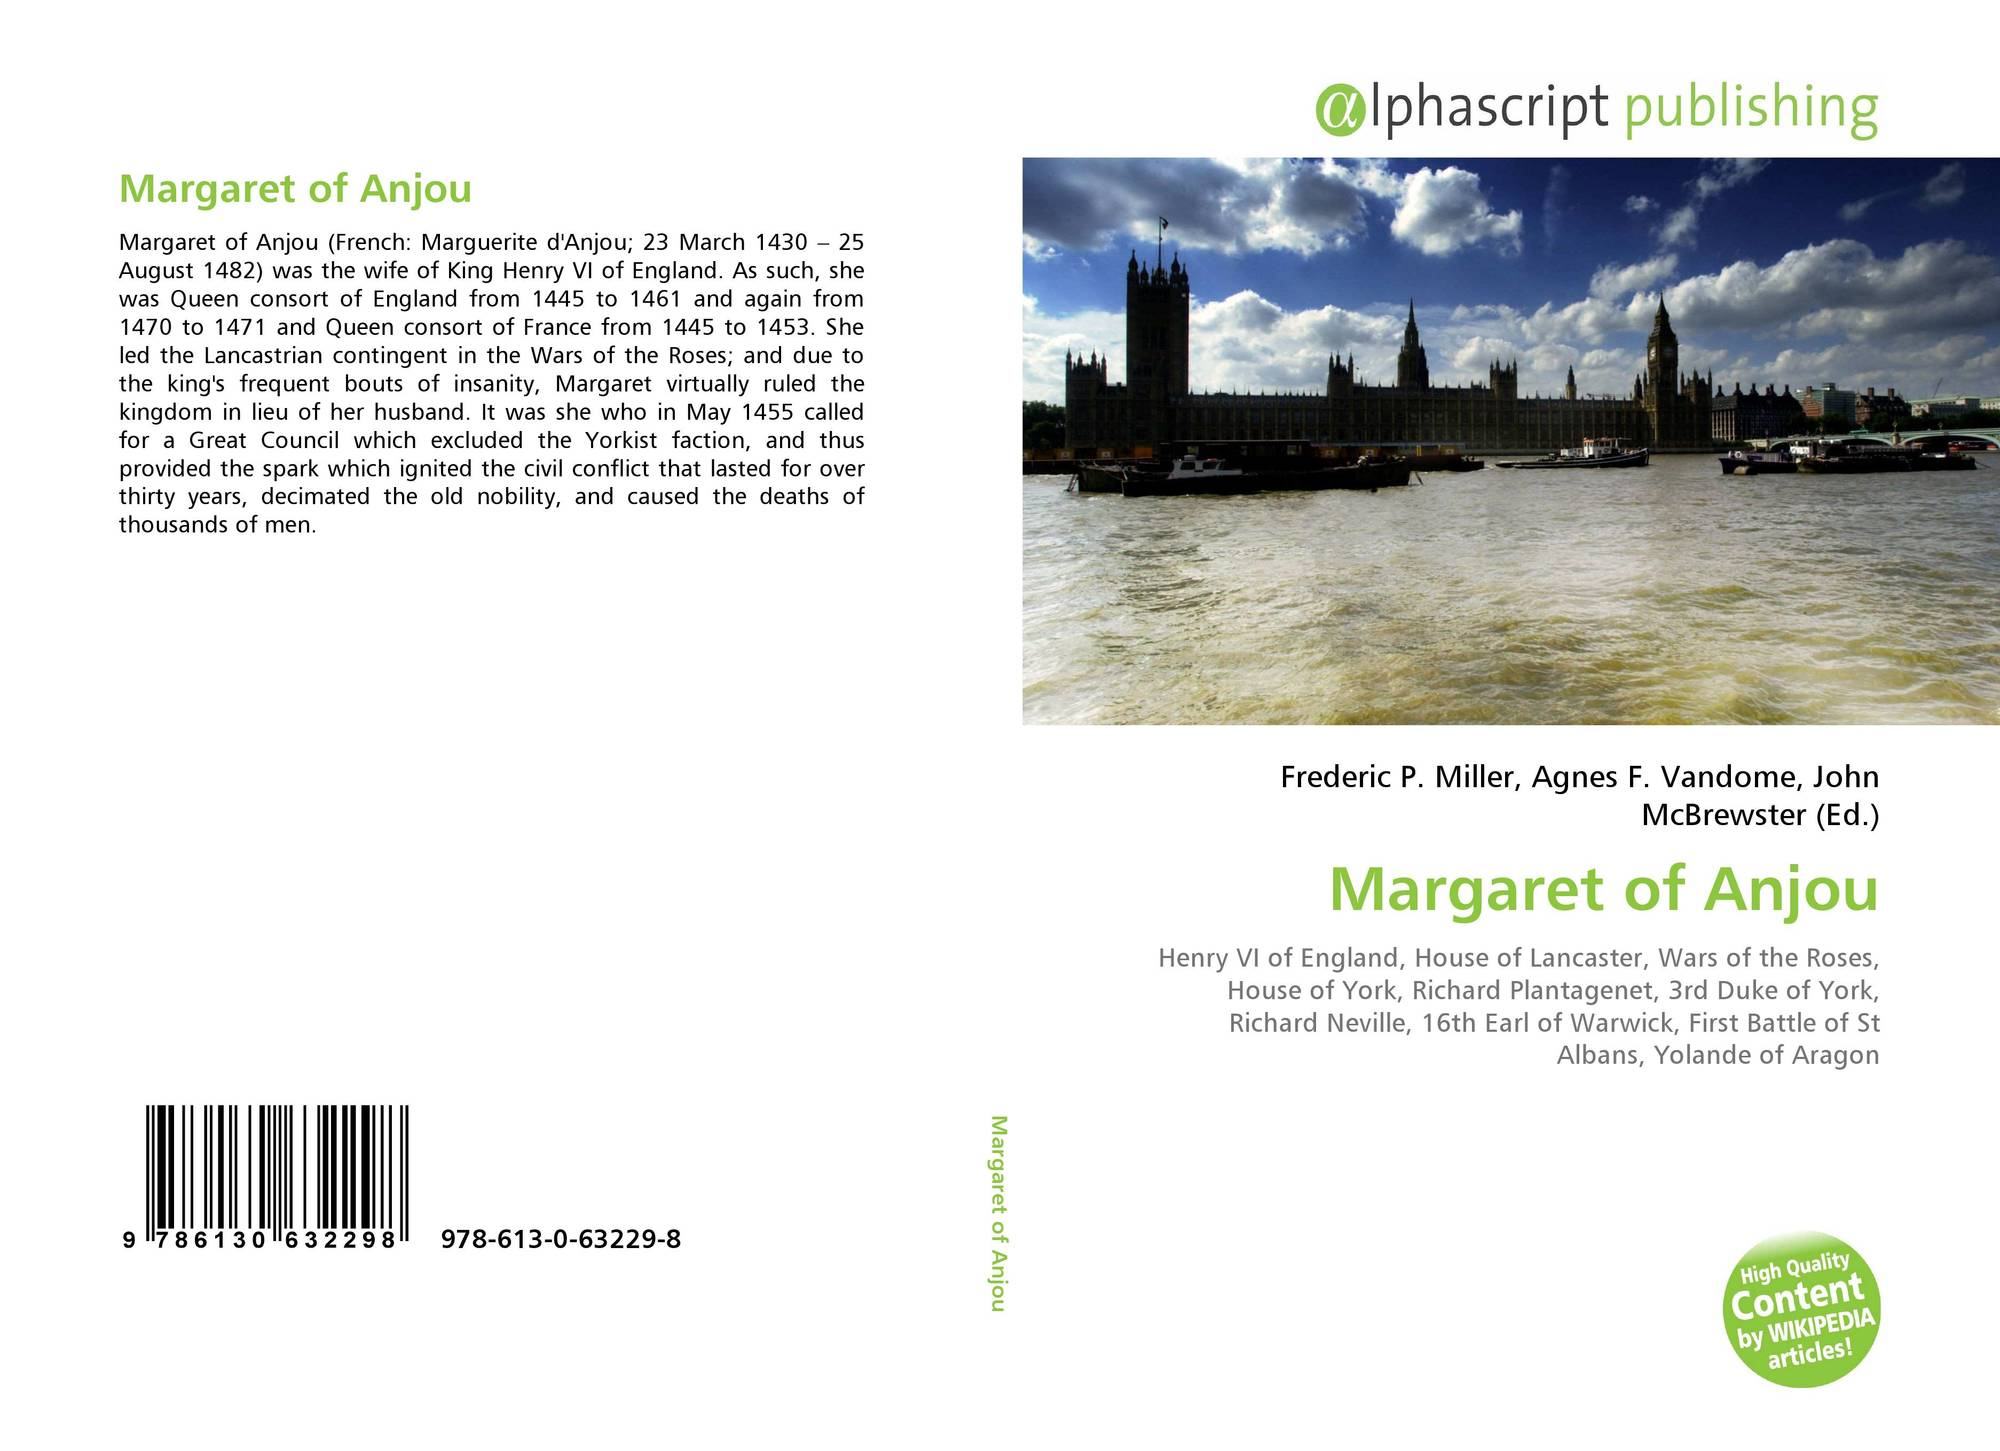 Margaret of Anjou, 978-613-0-63229-8, 6130632290 ,9786130632298